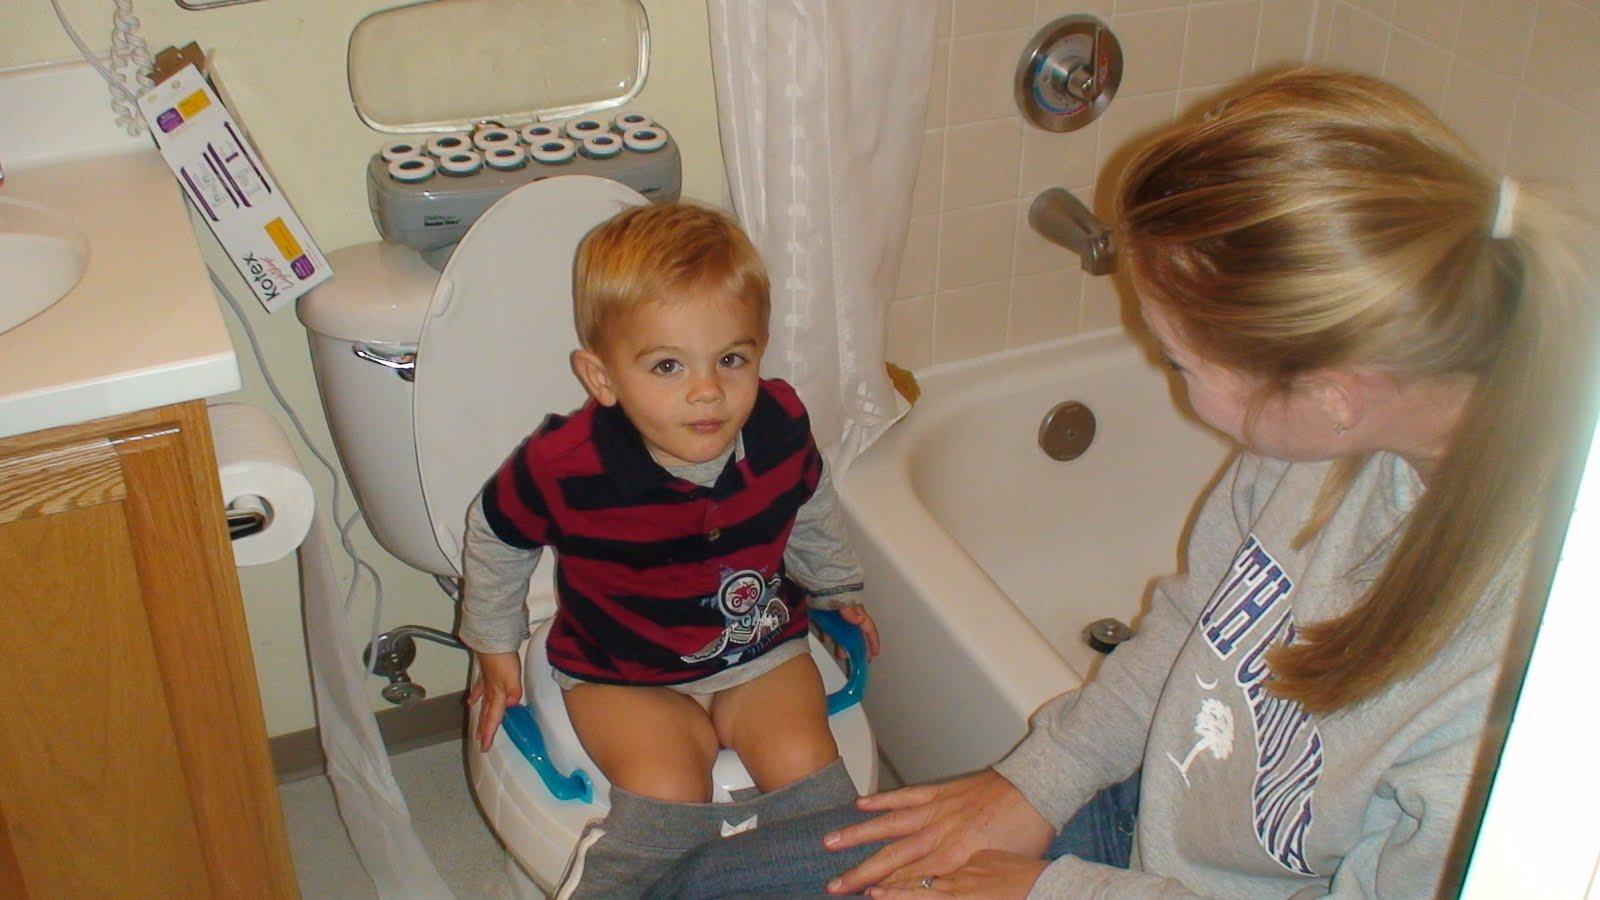 diaper i had pooped: